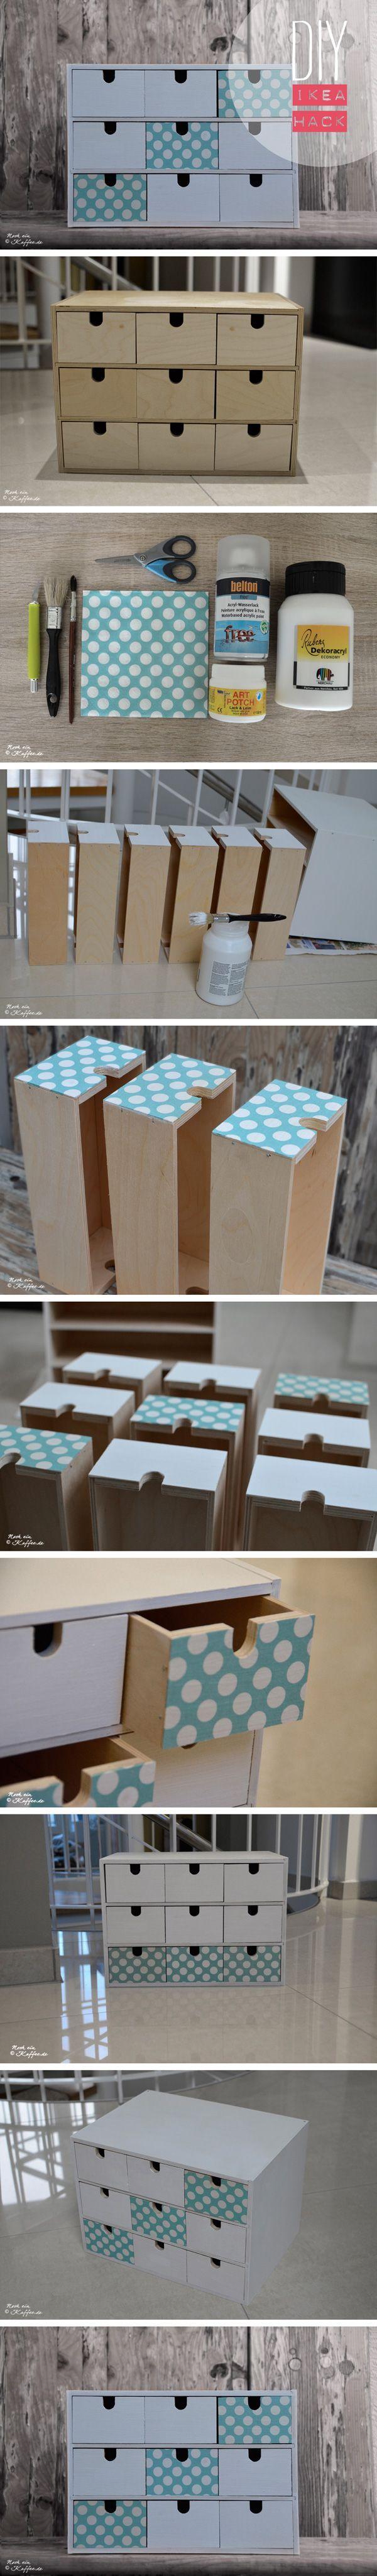 Ikea Hack: Schubladen Minikommode Fira im neuen Look – #Fira #Hack #ikea #im #MiniKommode